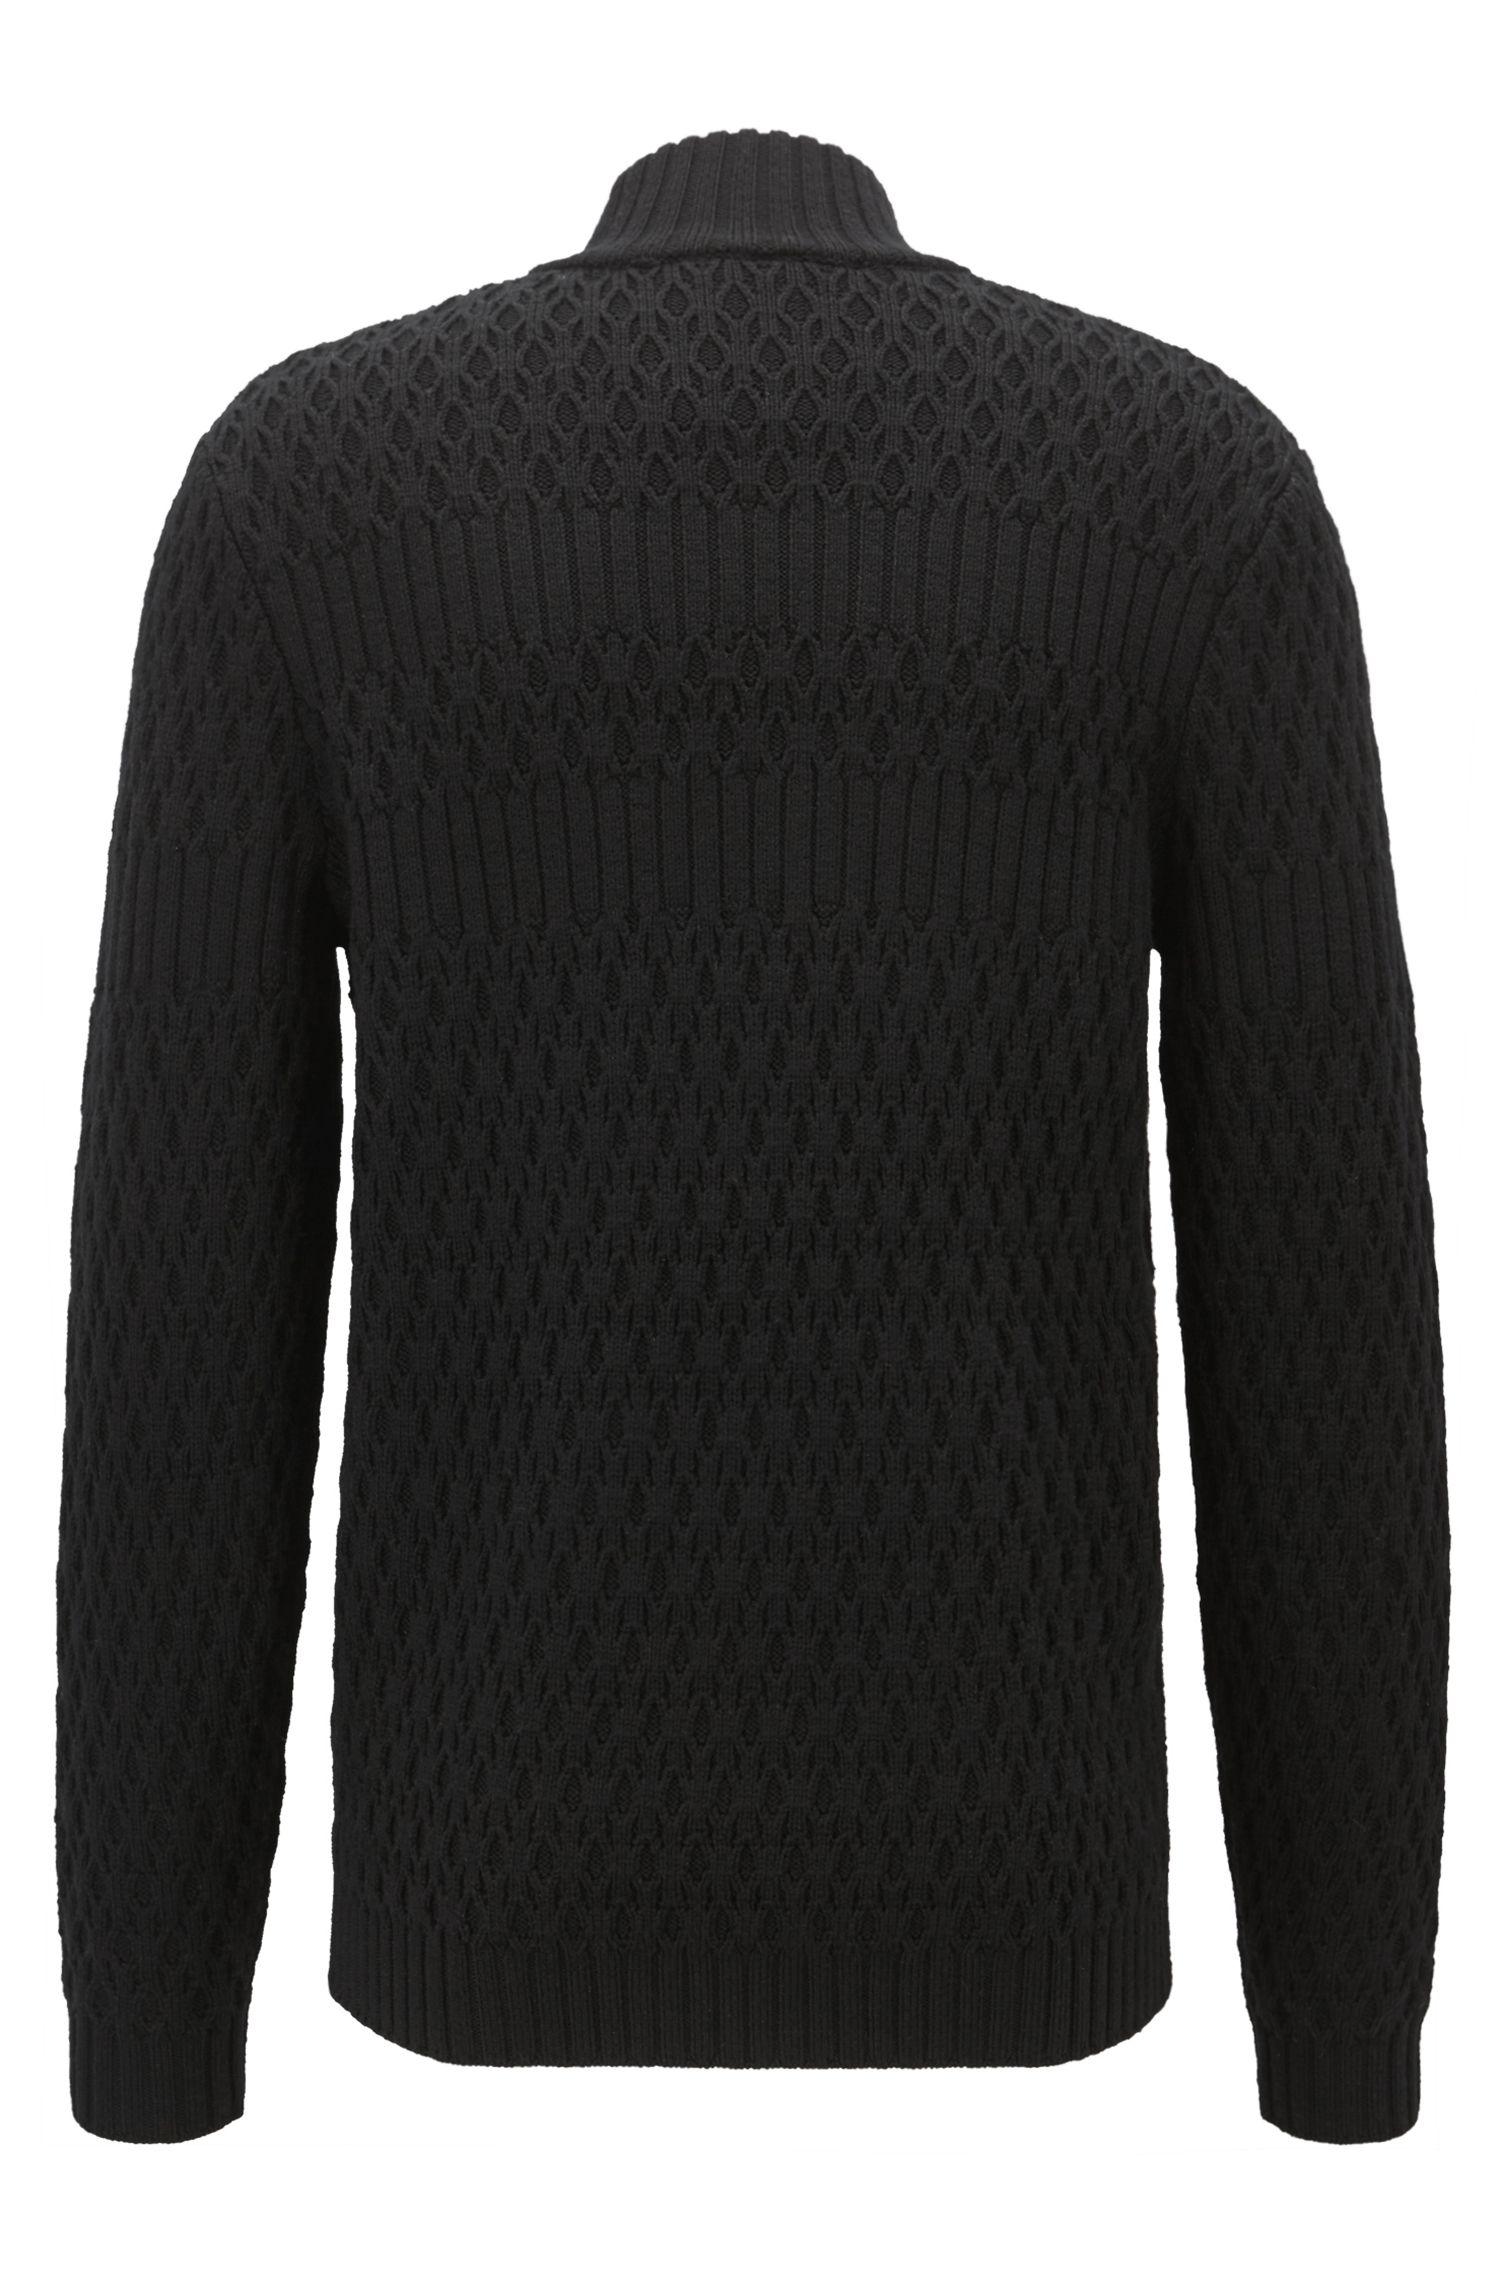 Long-sleeved turtleneck sweater in virgin wool